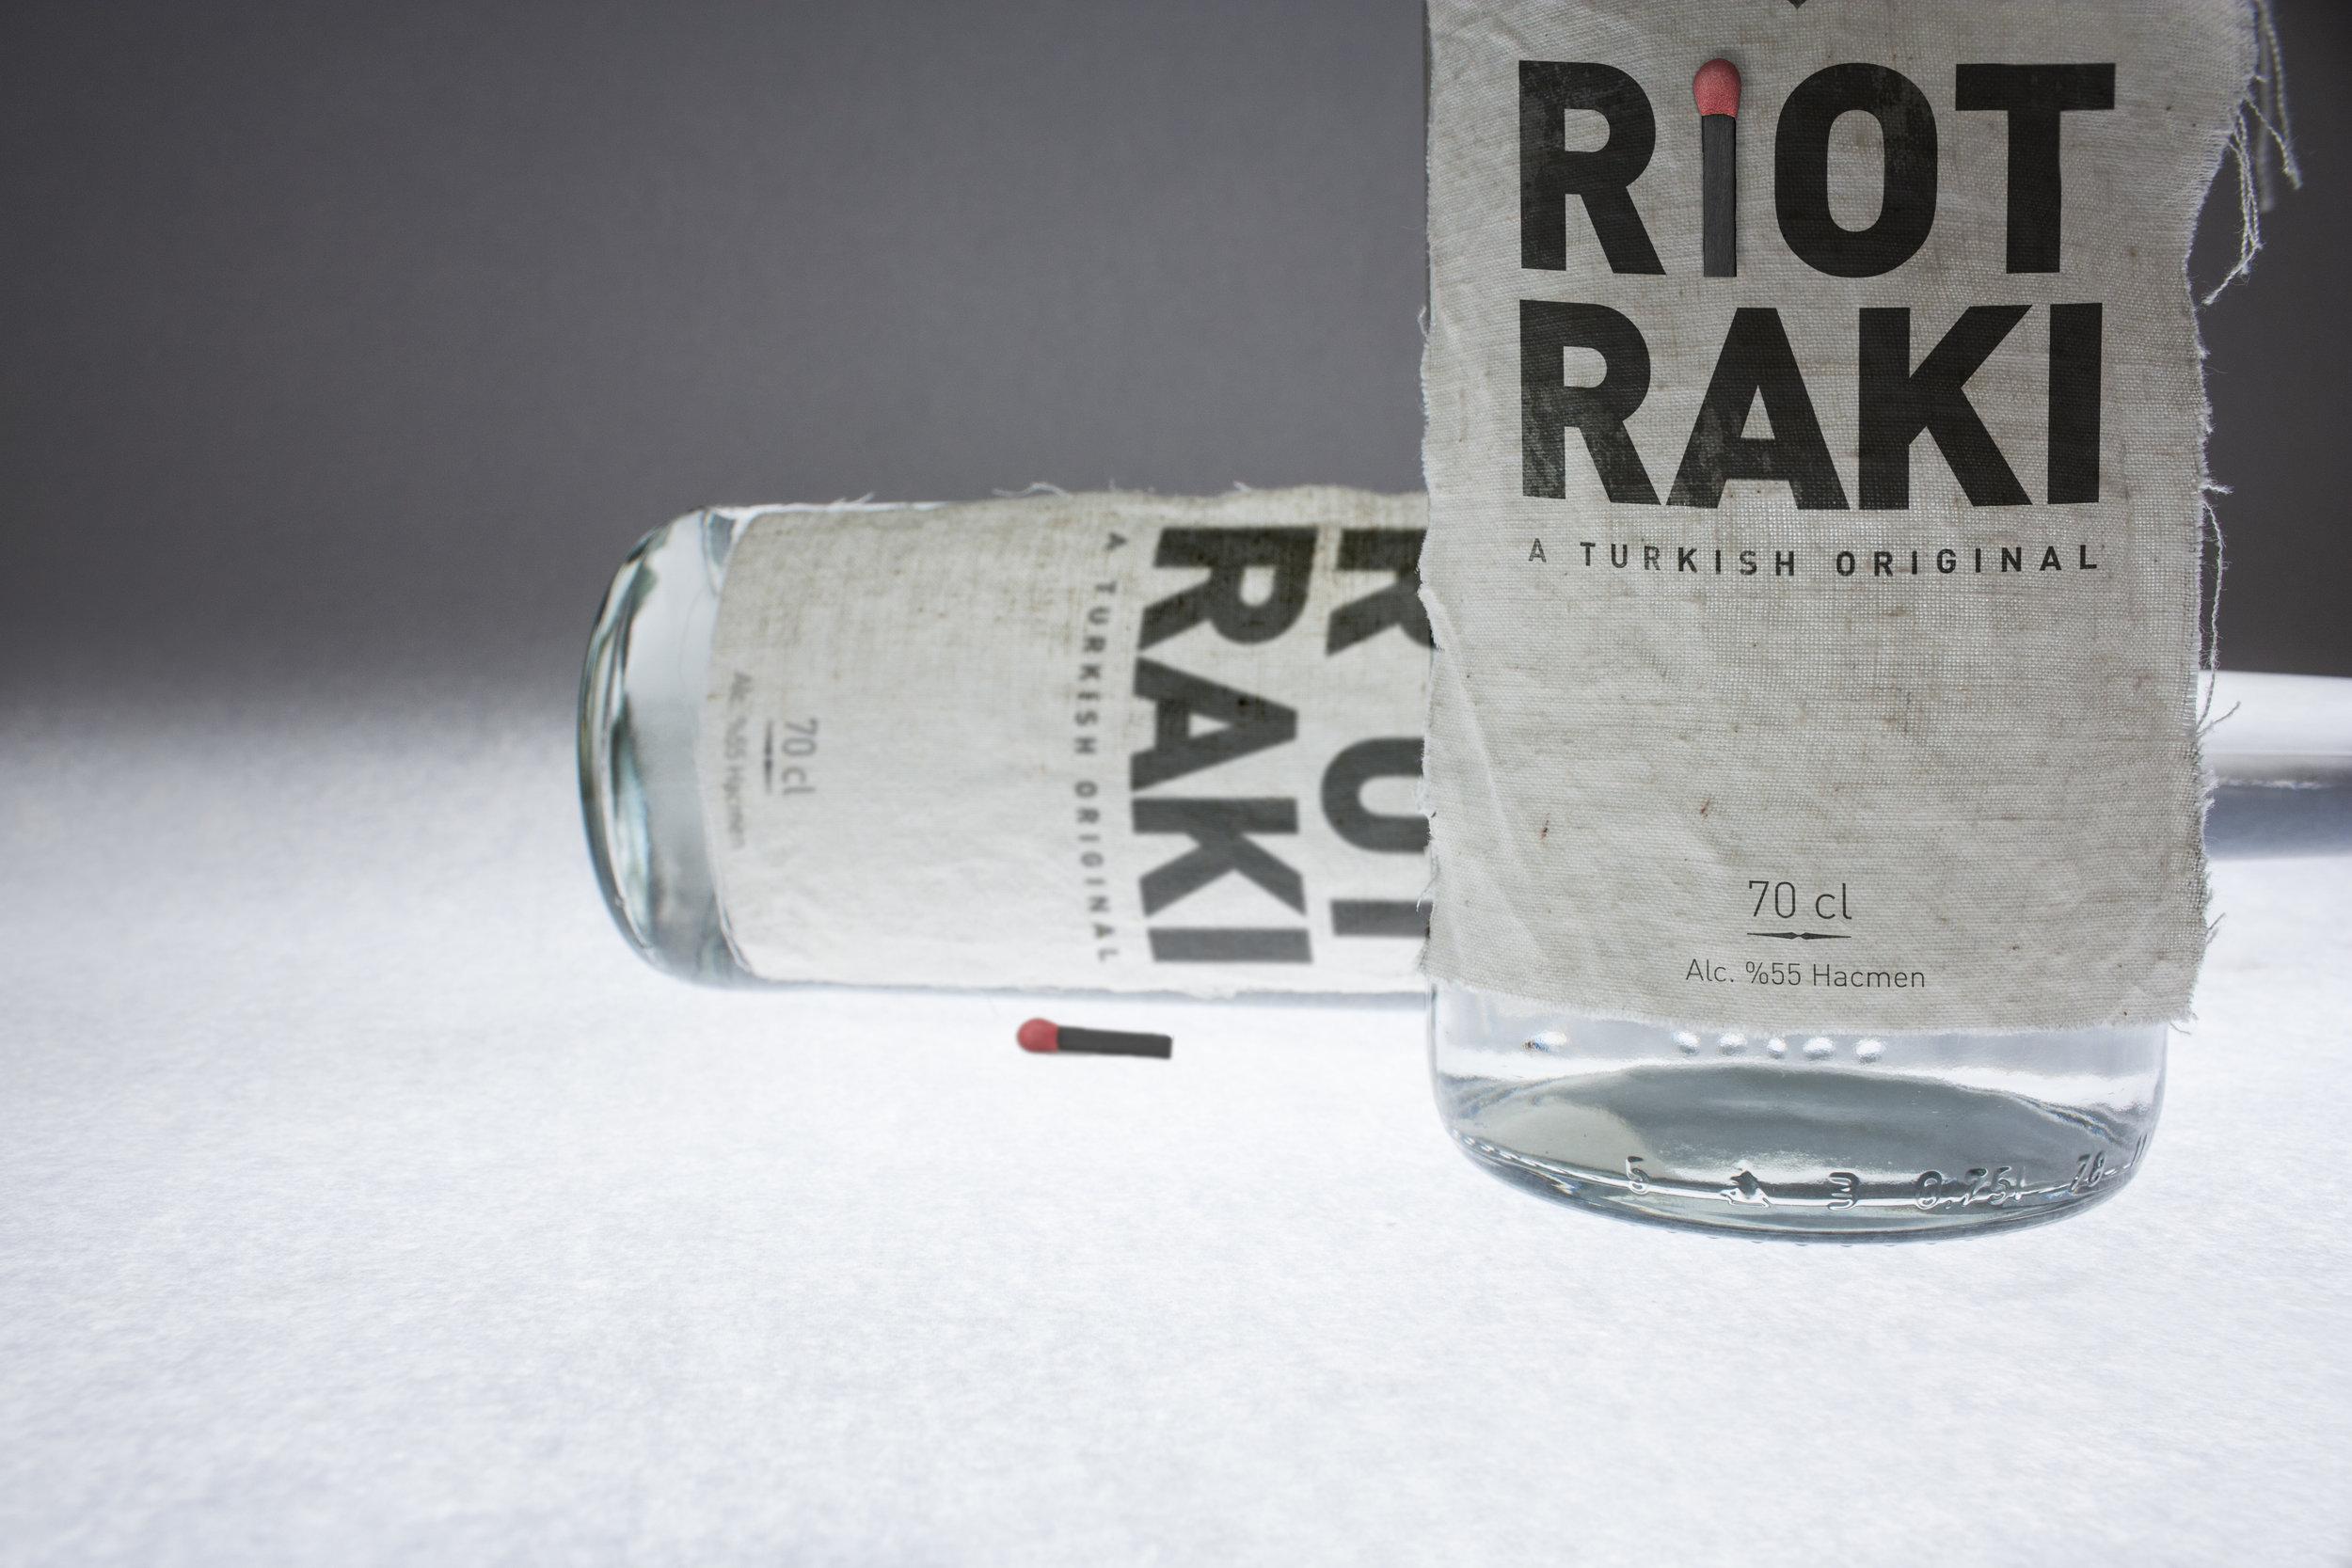 Riot_Raki_1.jpg